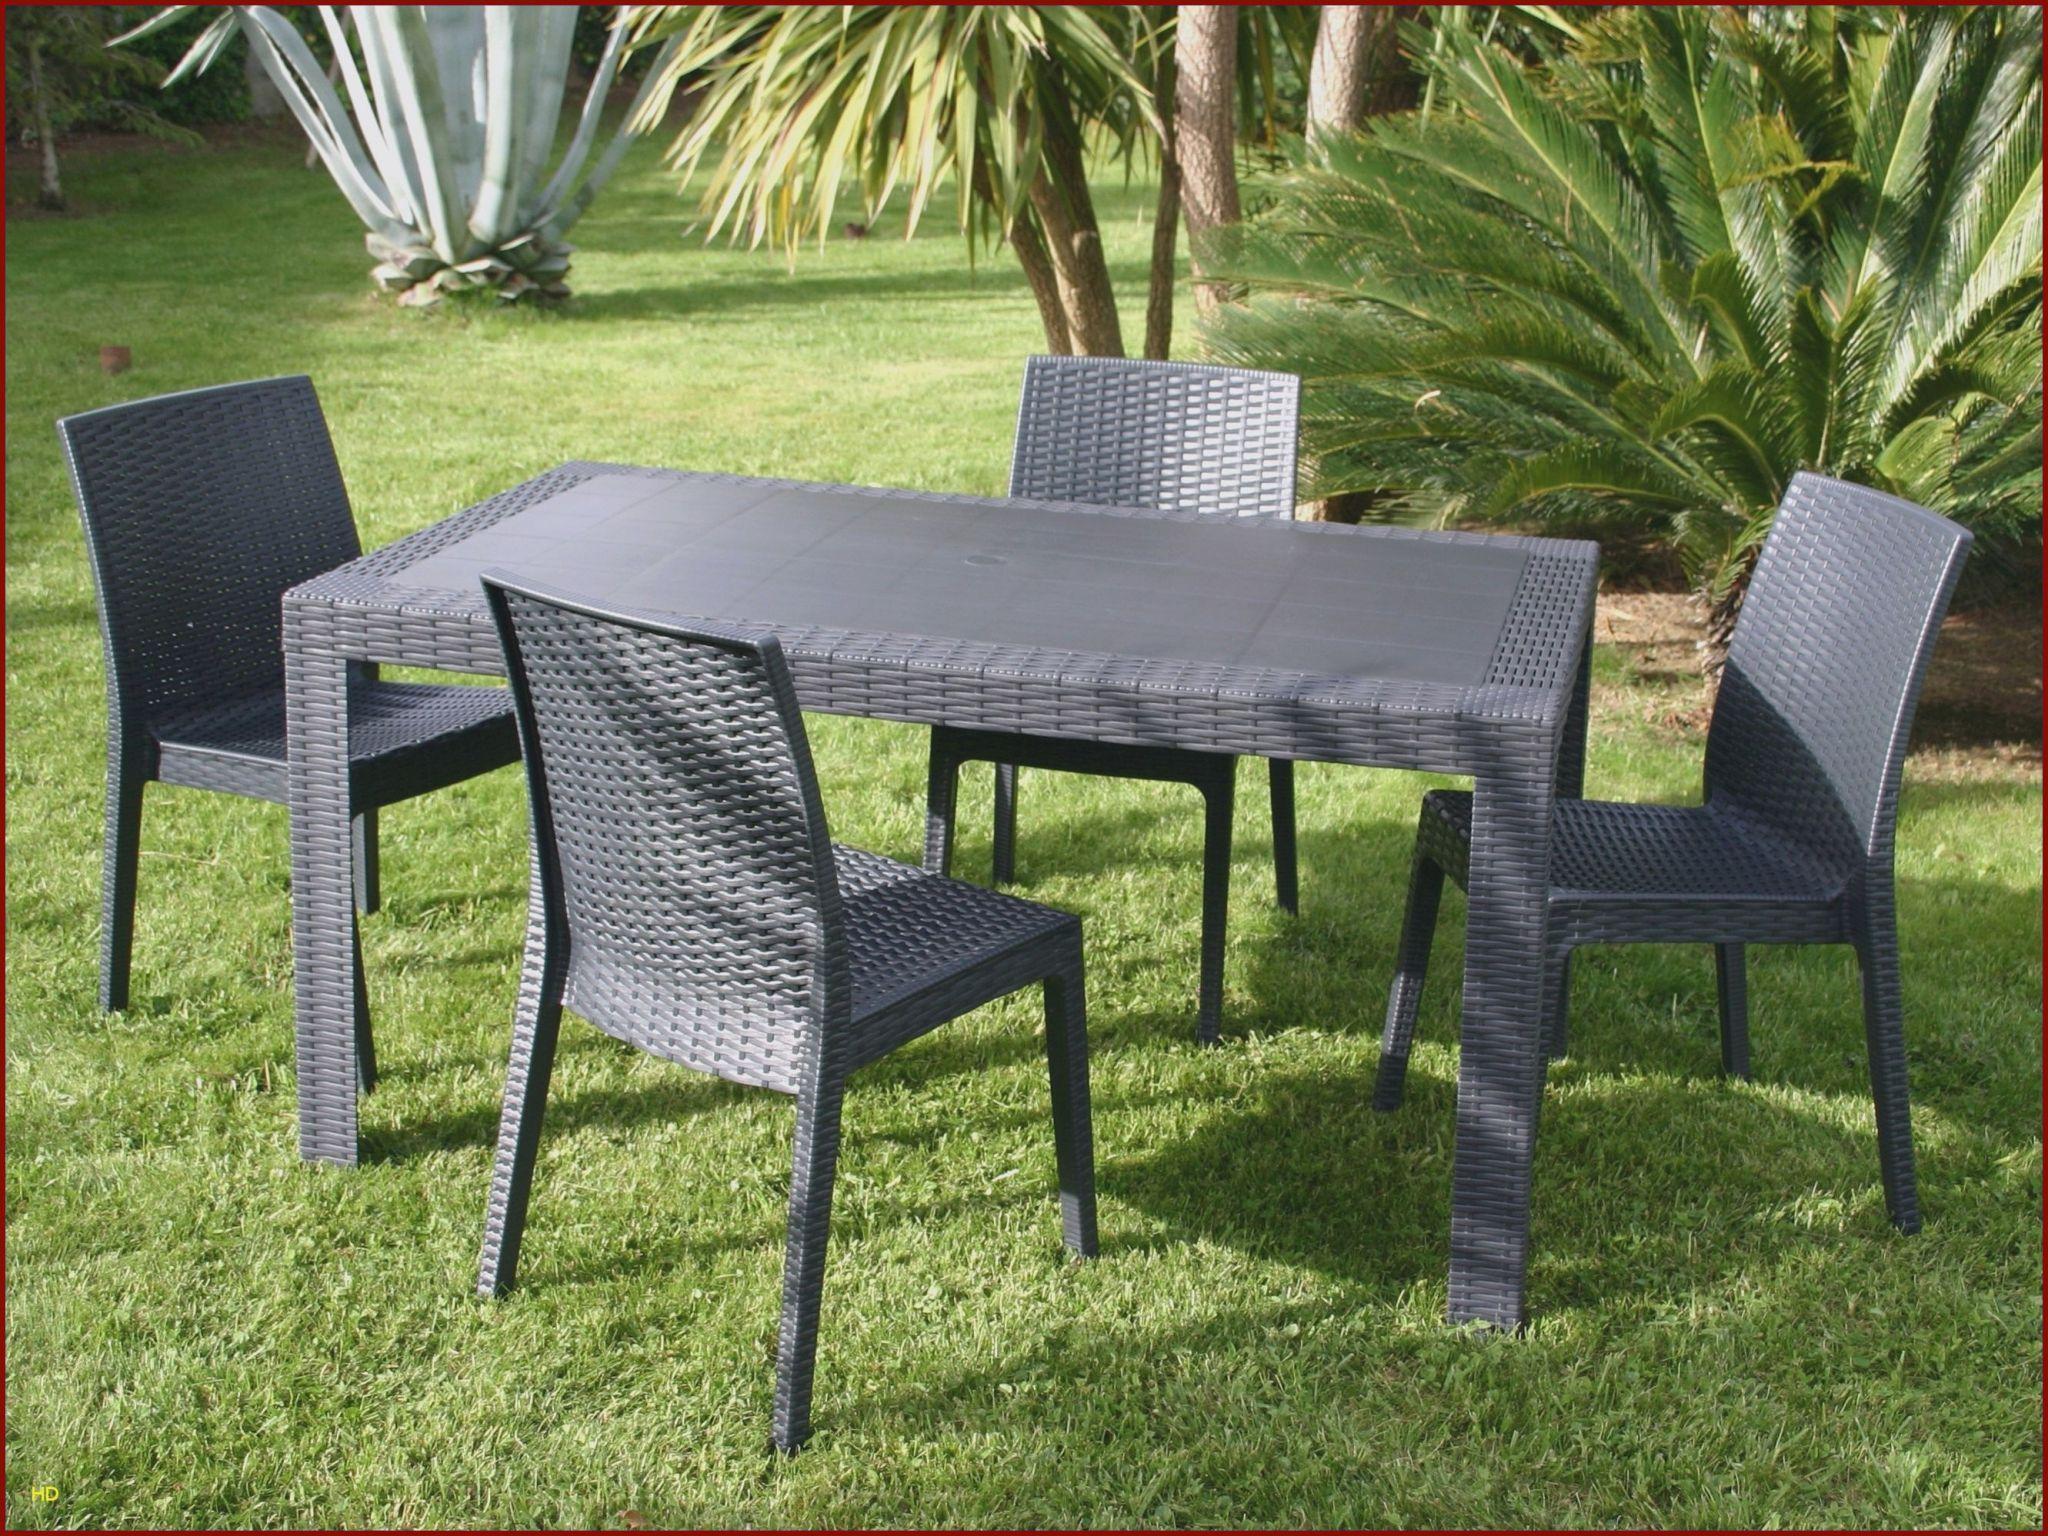 Salon De Jardin 2 Personnes Inspirant Chaises Luxe Chaise Ice 0d Table Jardin Resine Lovely